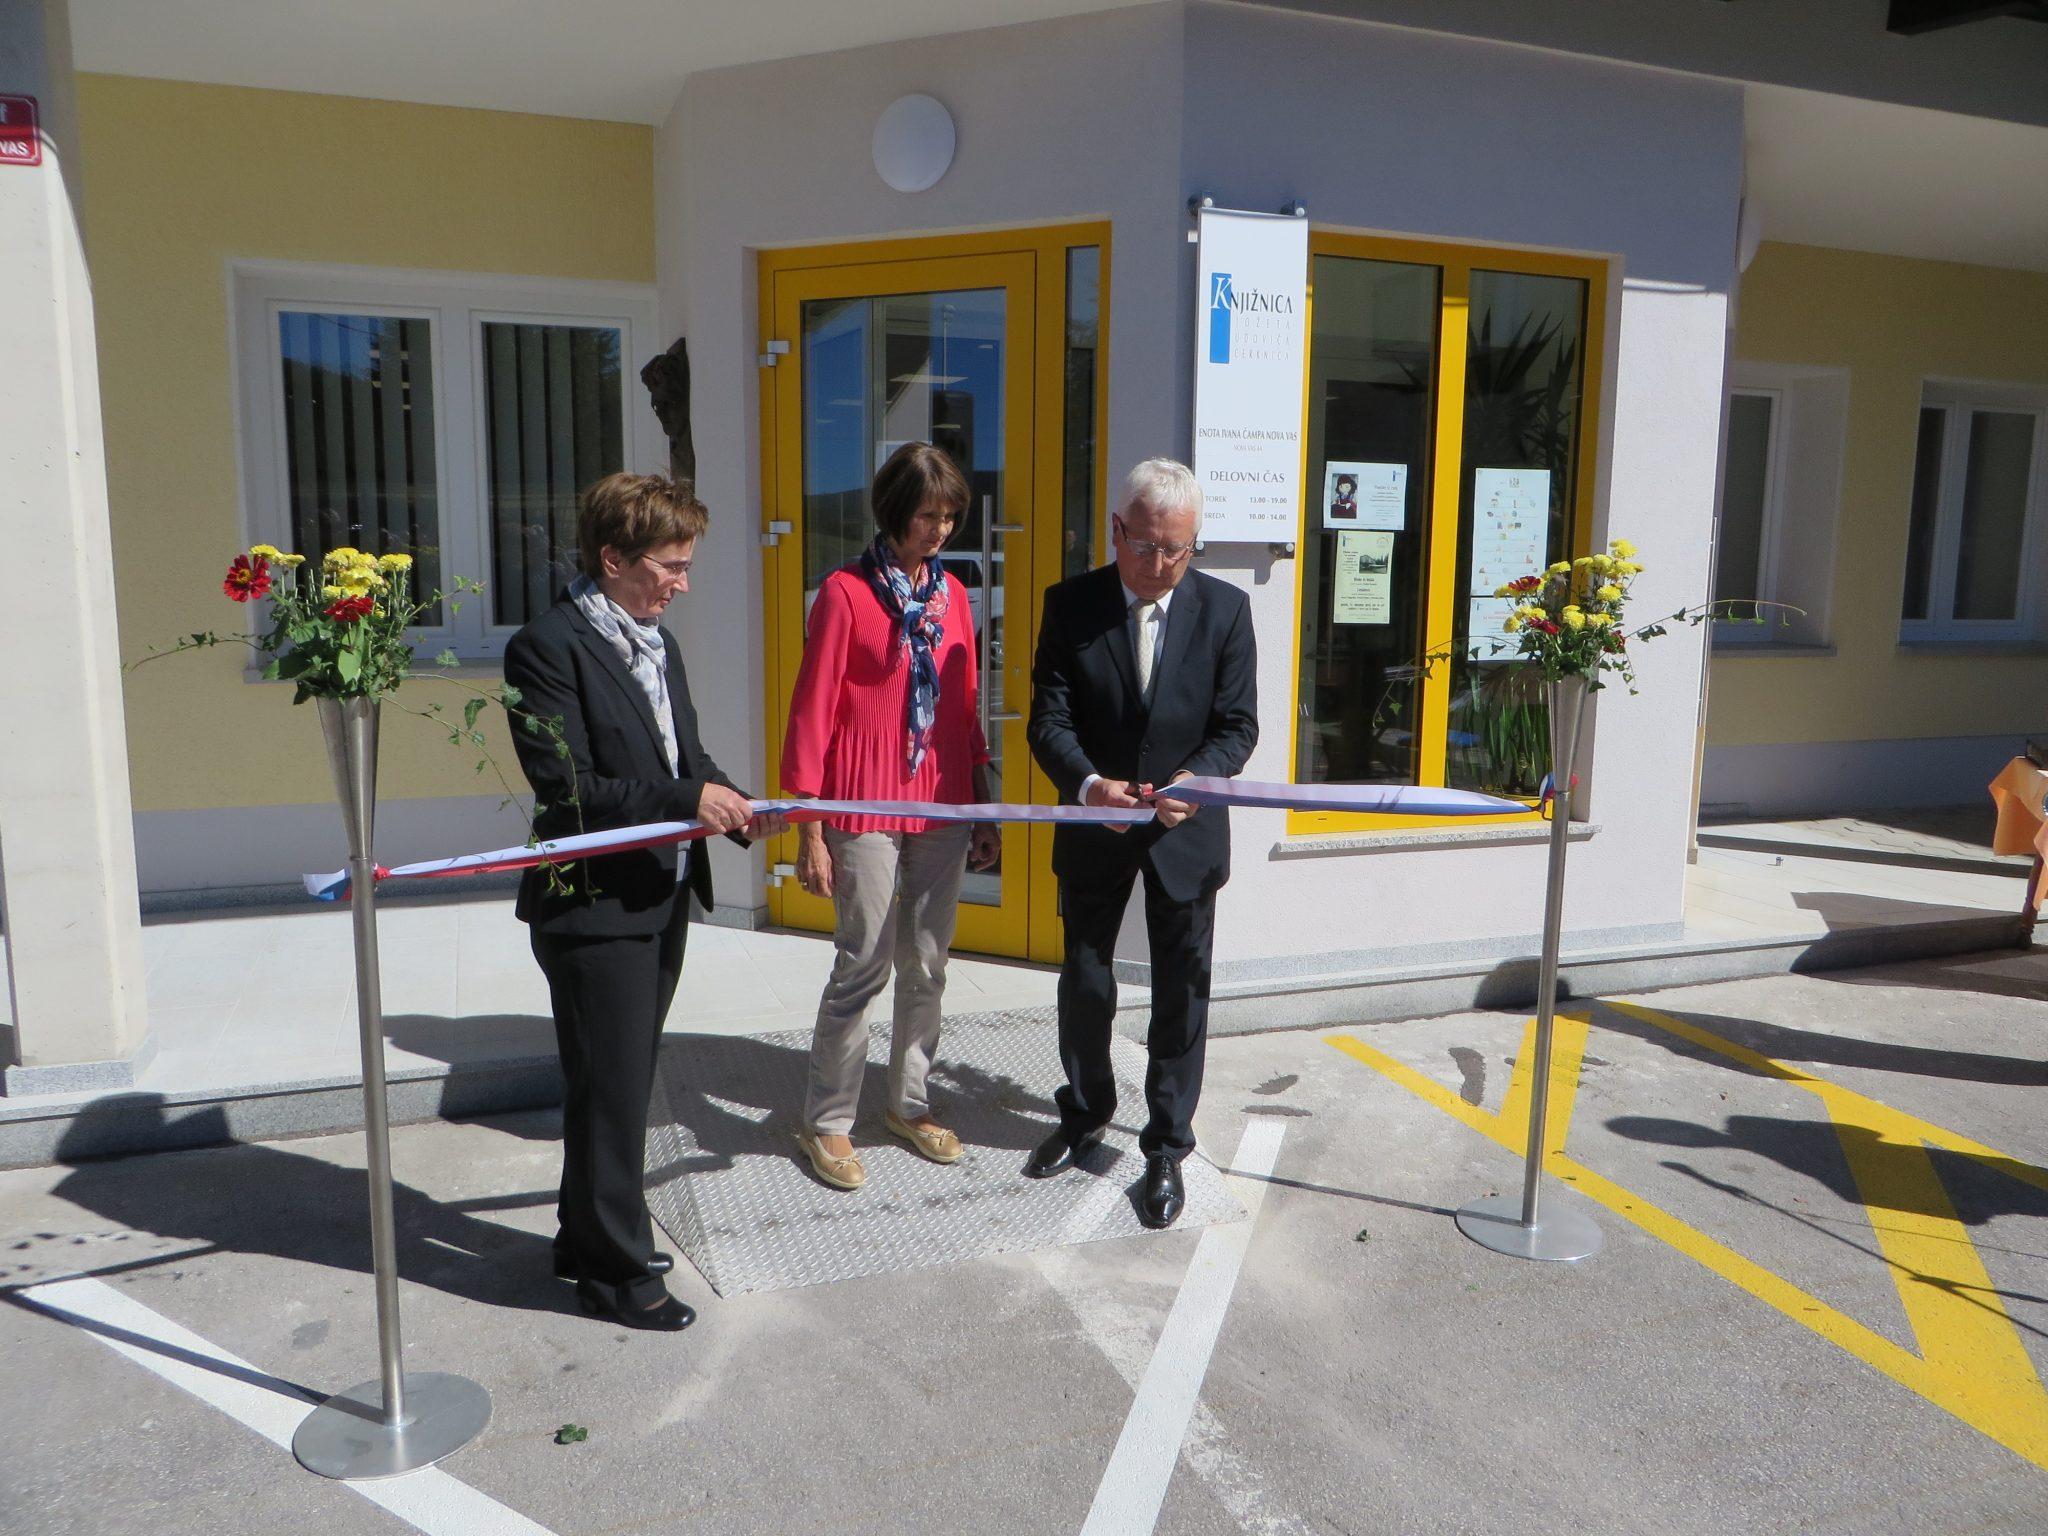 IMG 5305 - Odprtje novih prostorov KJUC – Enota Ivana Čampa Nova vas